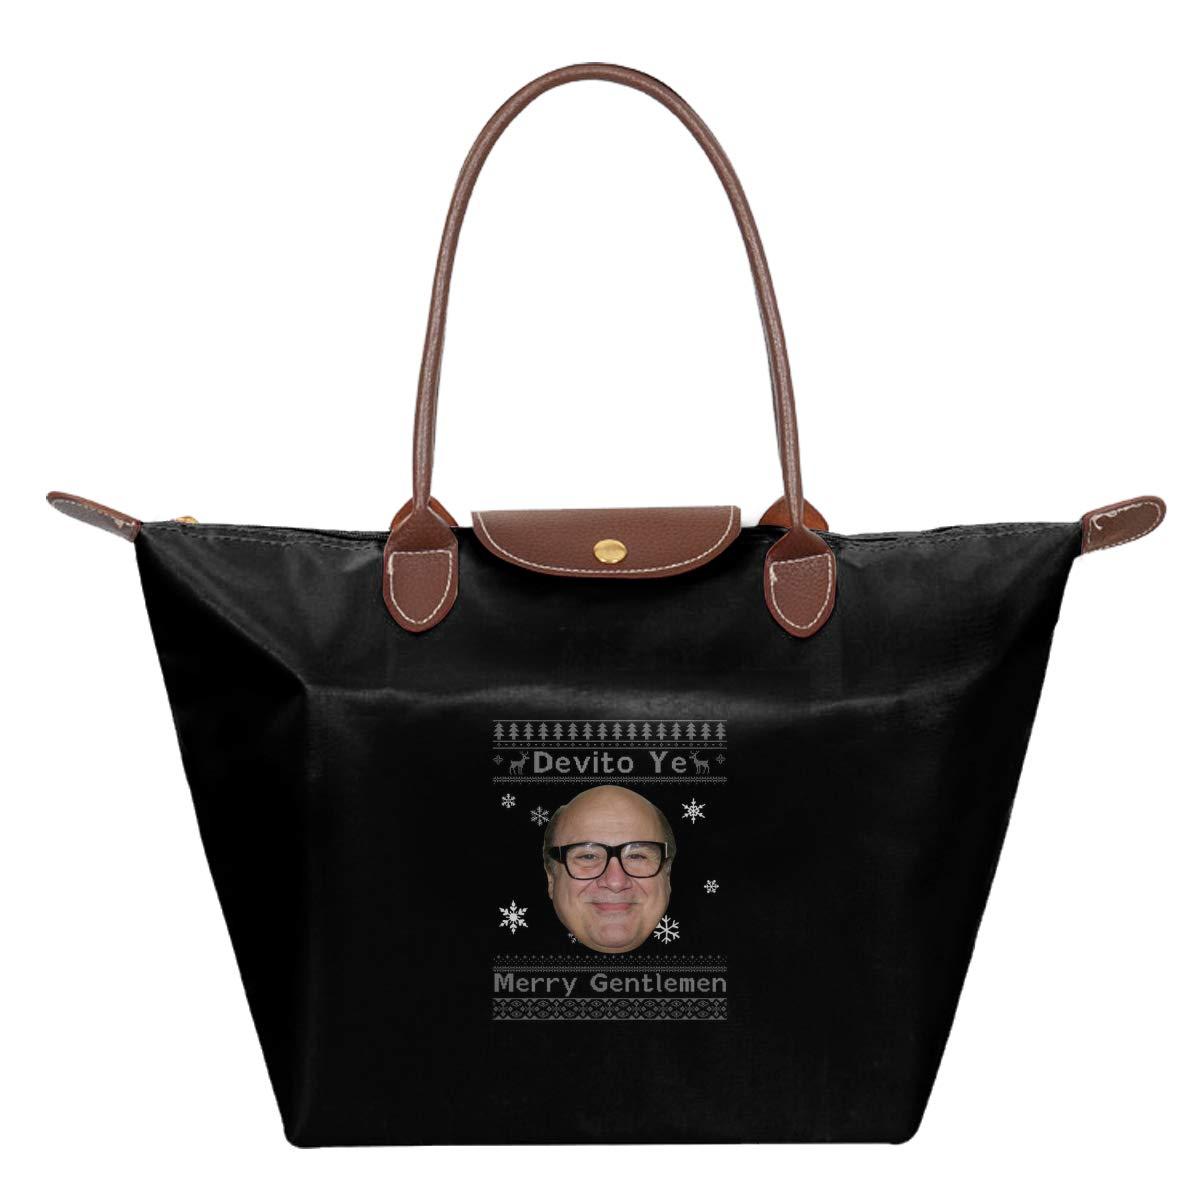 Danny Devito Ye Merry Gentlemen Christmas Knit Waterproof Leather Folded Messenger Nylon Bag Travel Tote Hopping Folding School Handbags